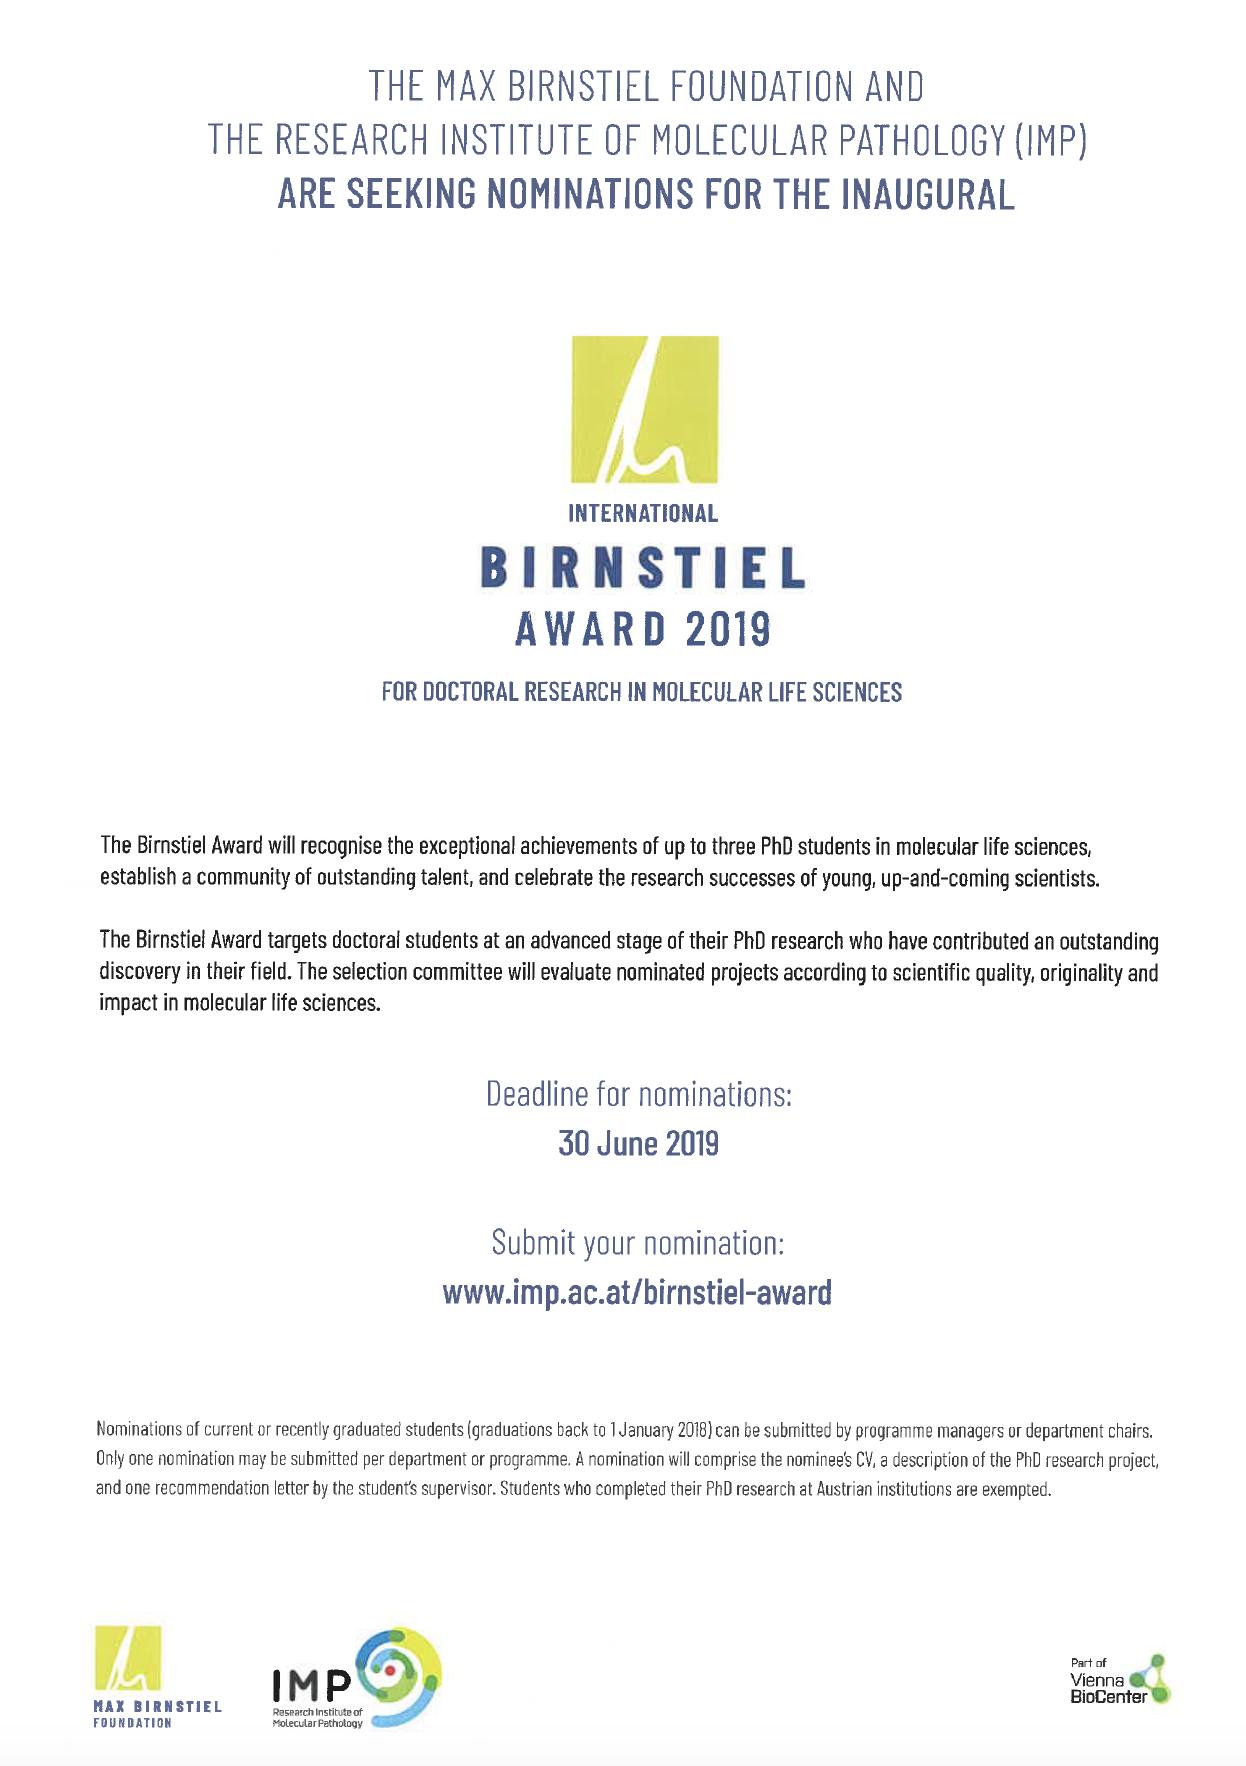 Birnstiel award 2019 – nomination deadline: June 30, 2019